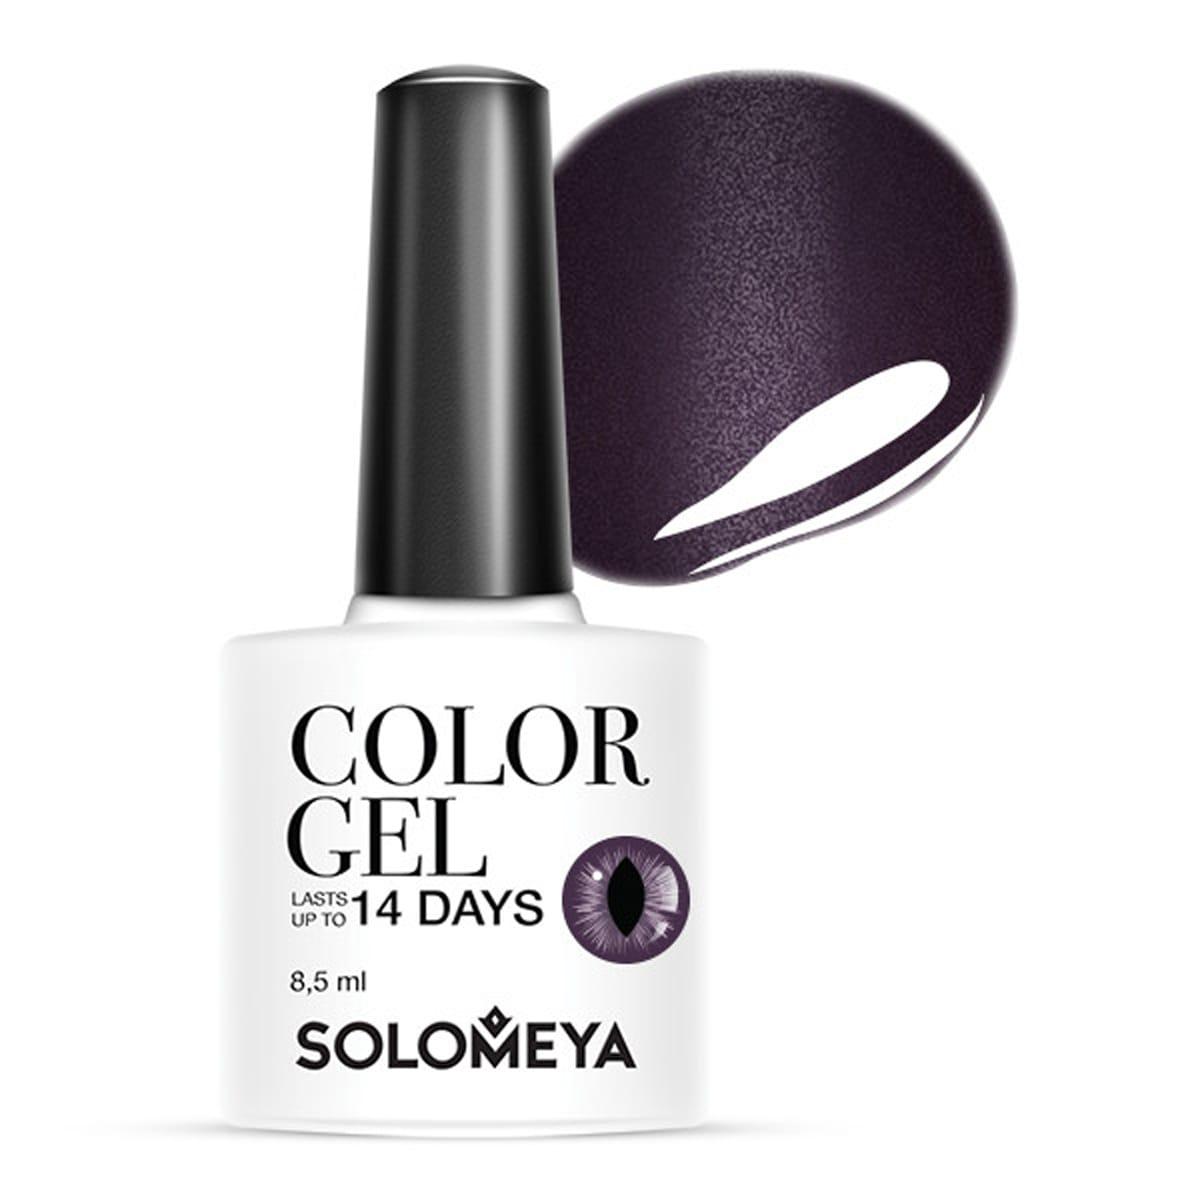 SOLOMEYA Гель-лак для ногтей SCE007 Кошачий глаз, глубокий фиолетовый / Cat Eye Gel Deep Purple 8,5 мл цена